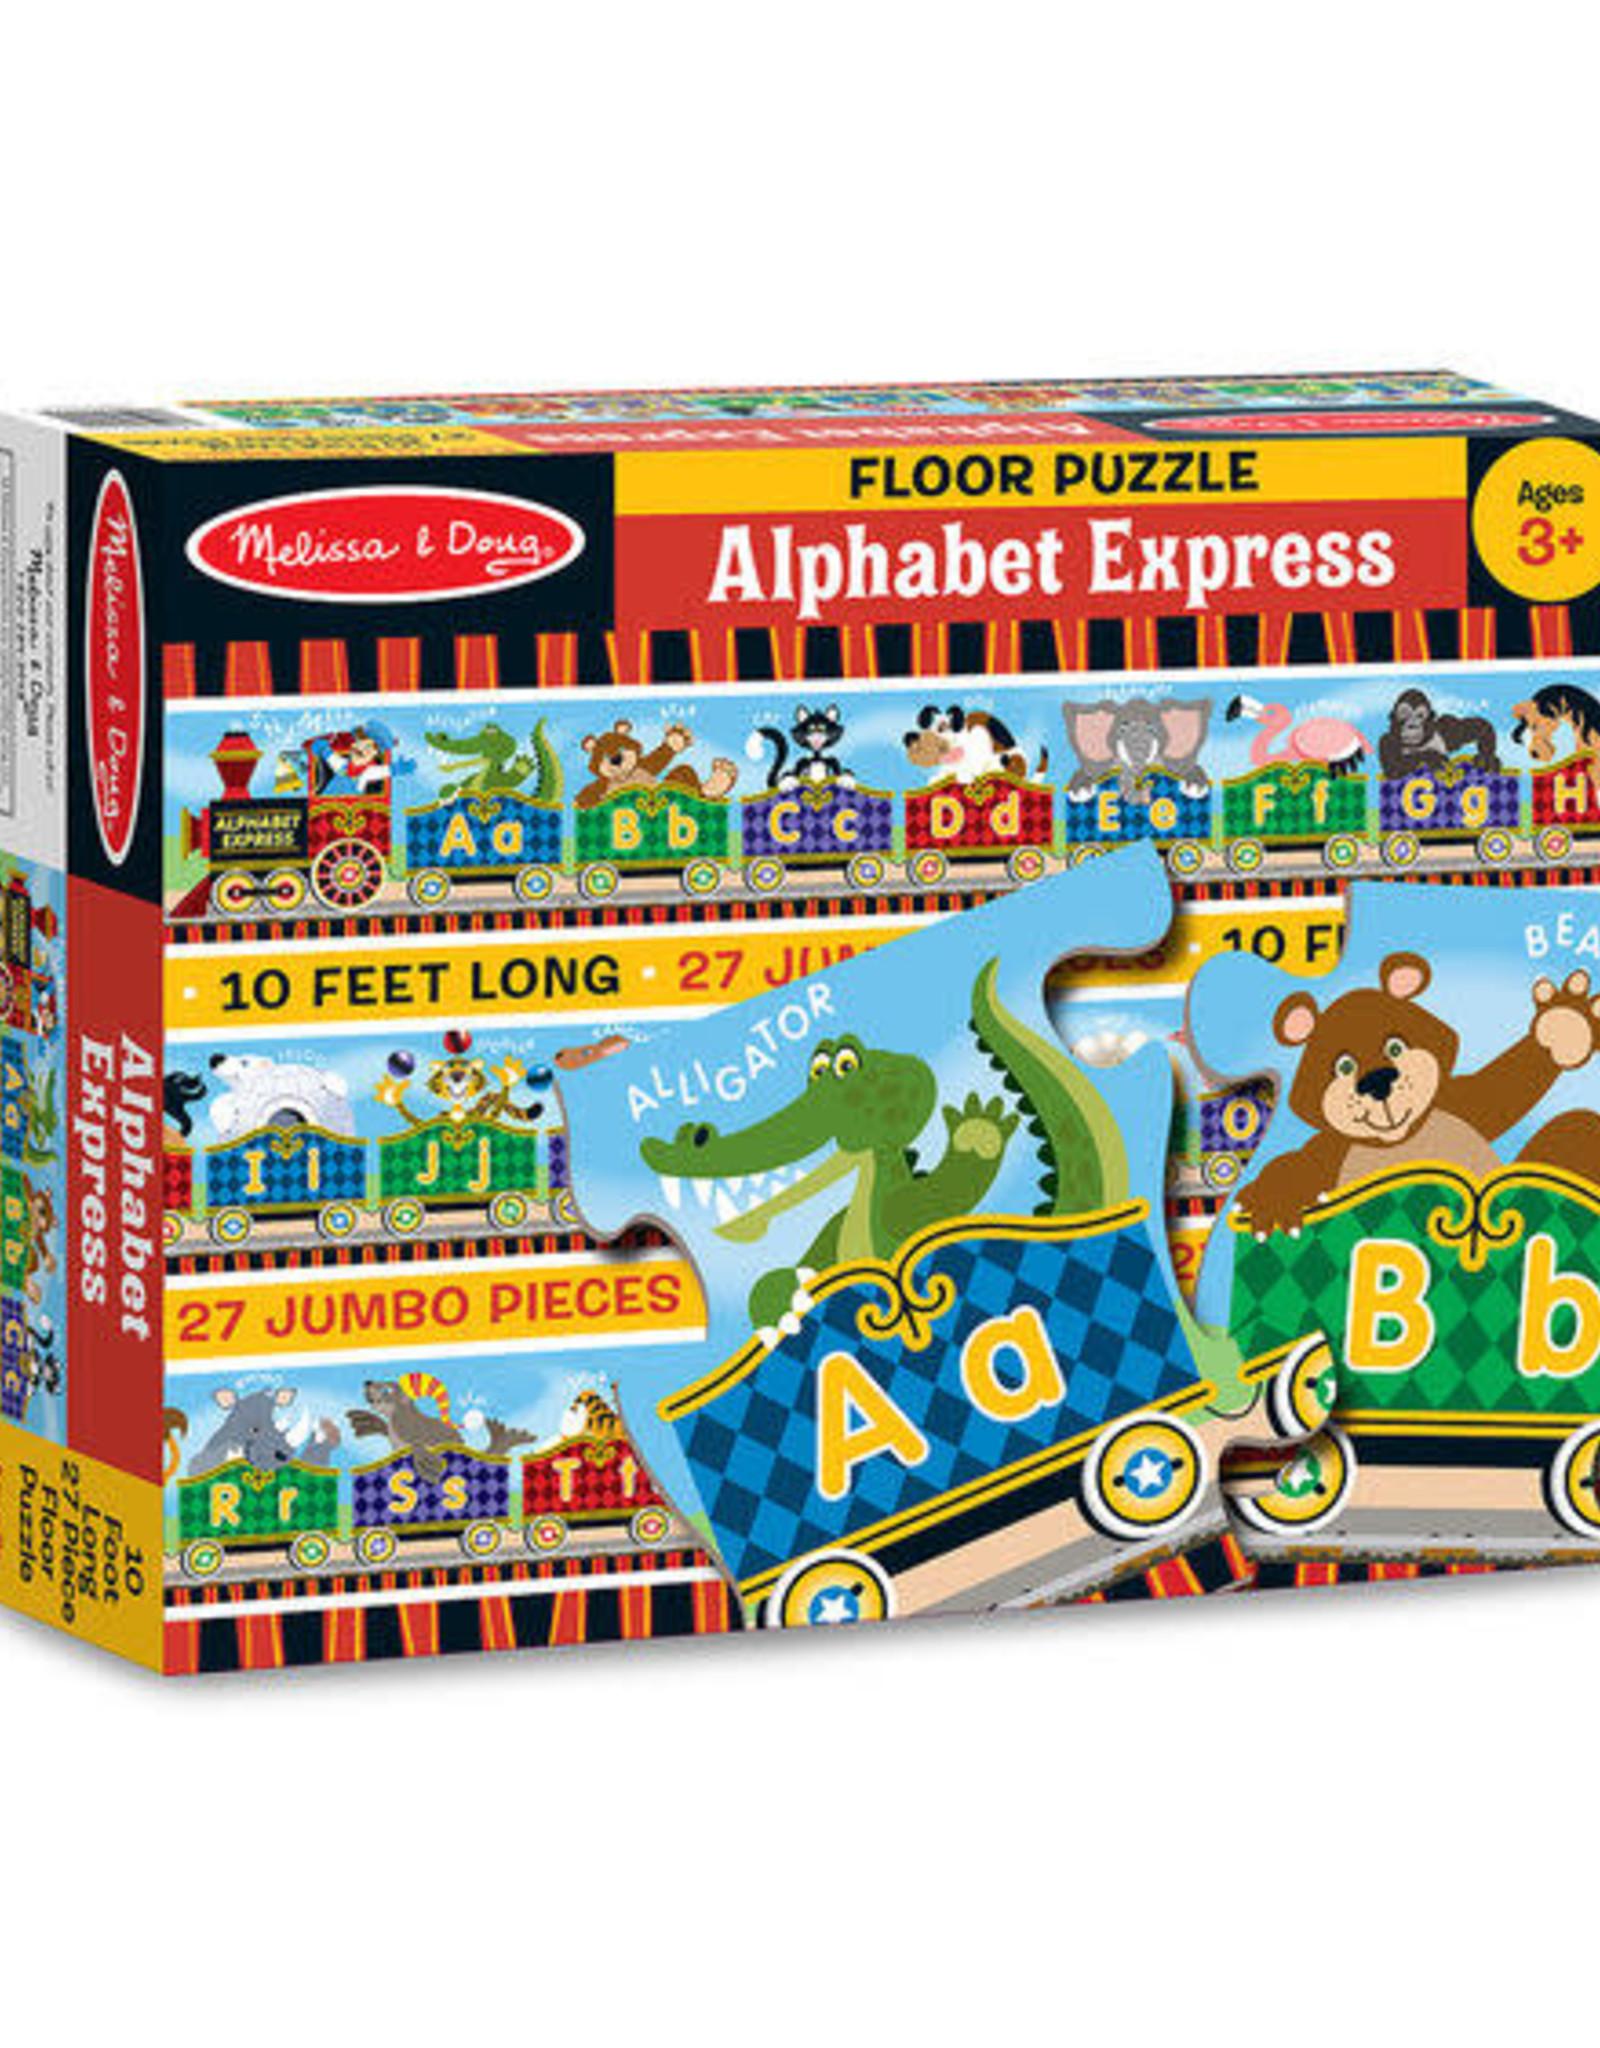 Melissa & Doug MD 27pc Floor Puzzle 10ft Alphabet Express